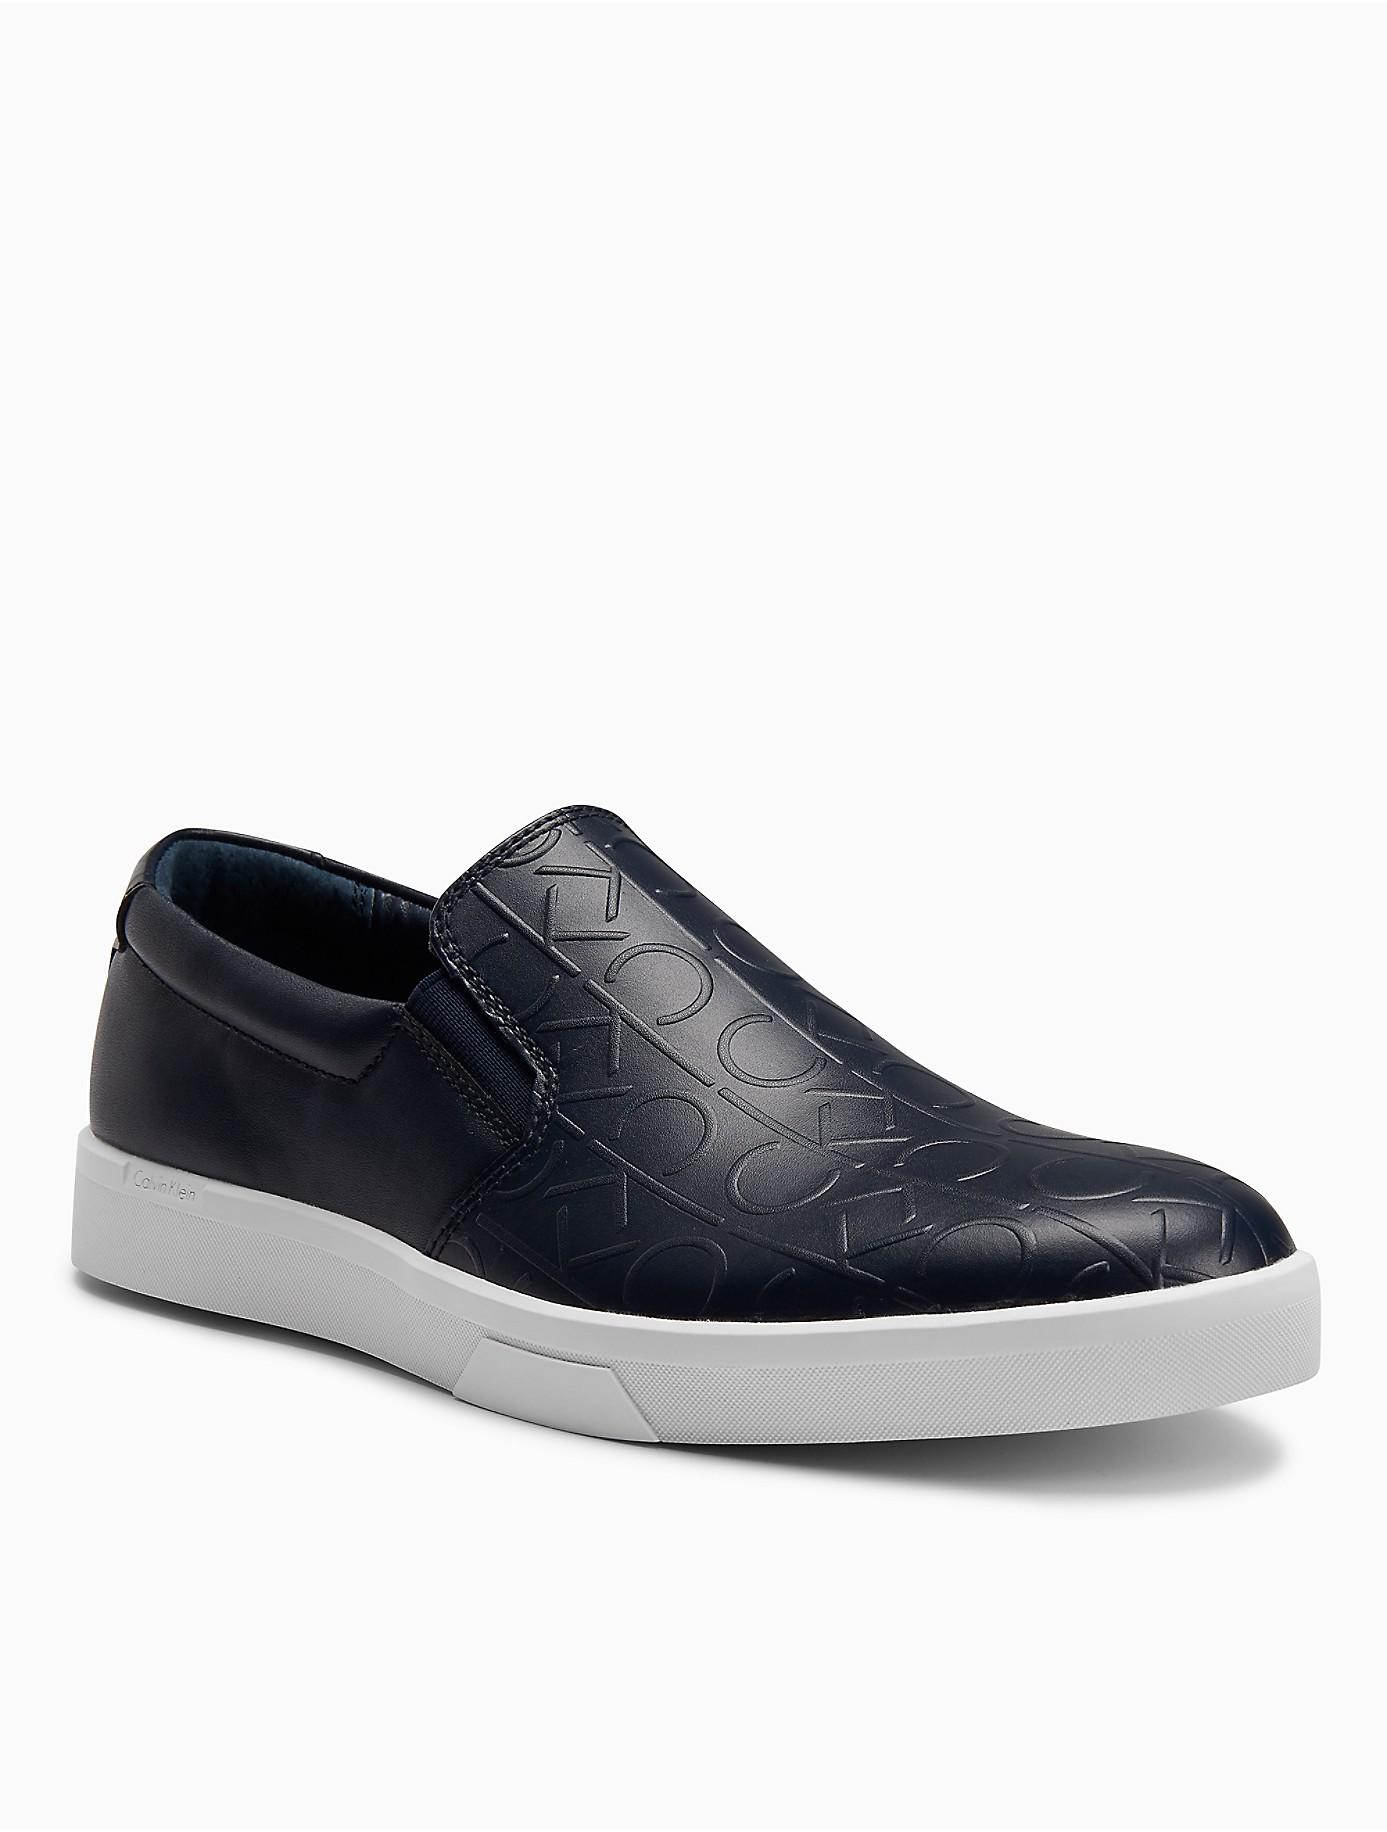 slip-on low-top sneakers - Black CALVIN KLEIN 205W39NYC CIVffp